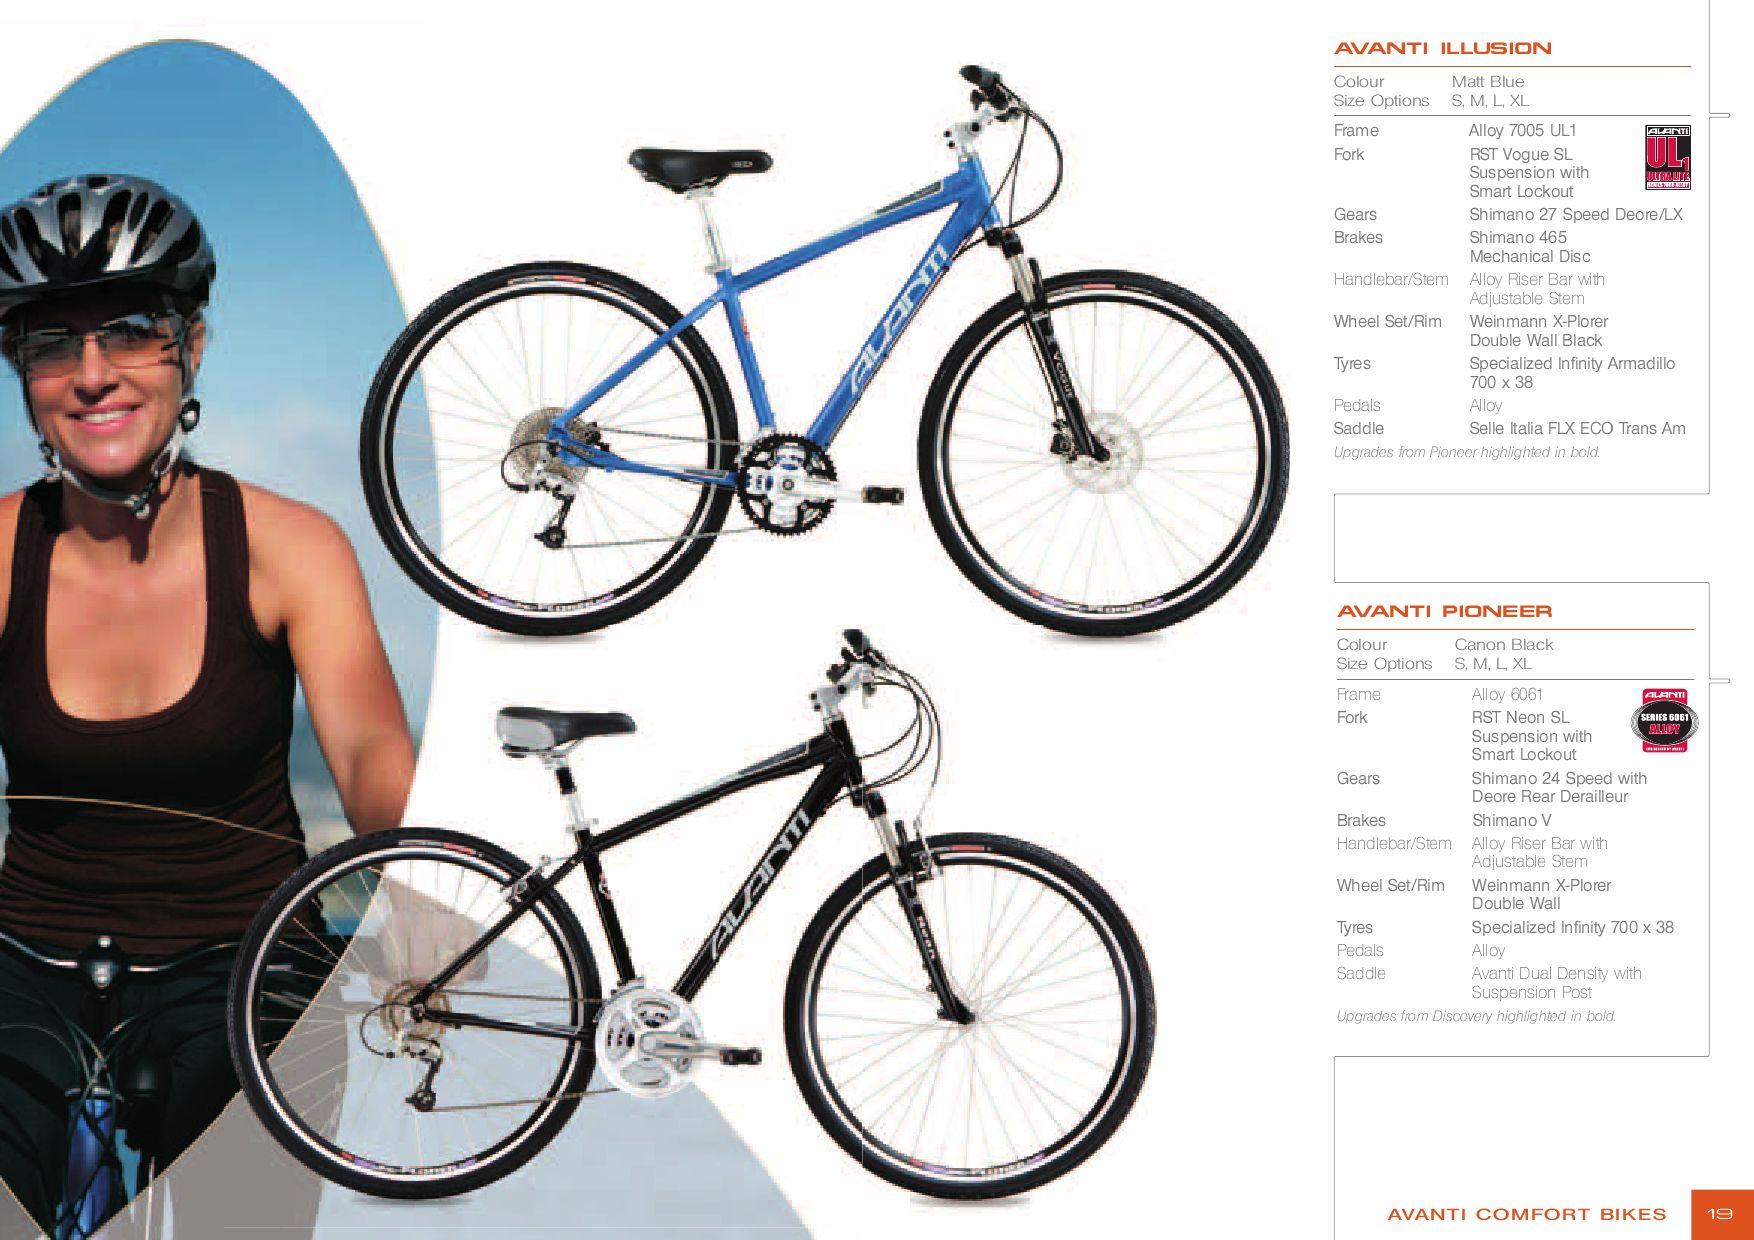 2007 Avanti Bike Catalogue by AvantiPlus Cycles - issuu